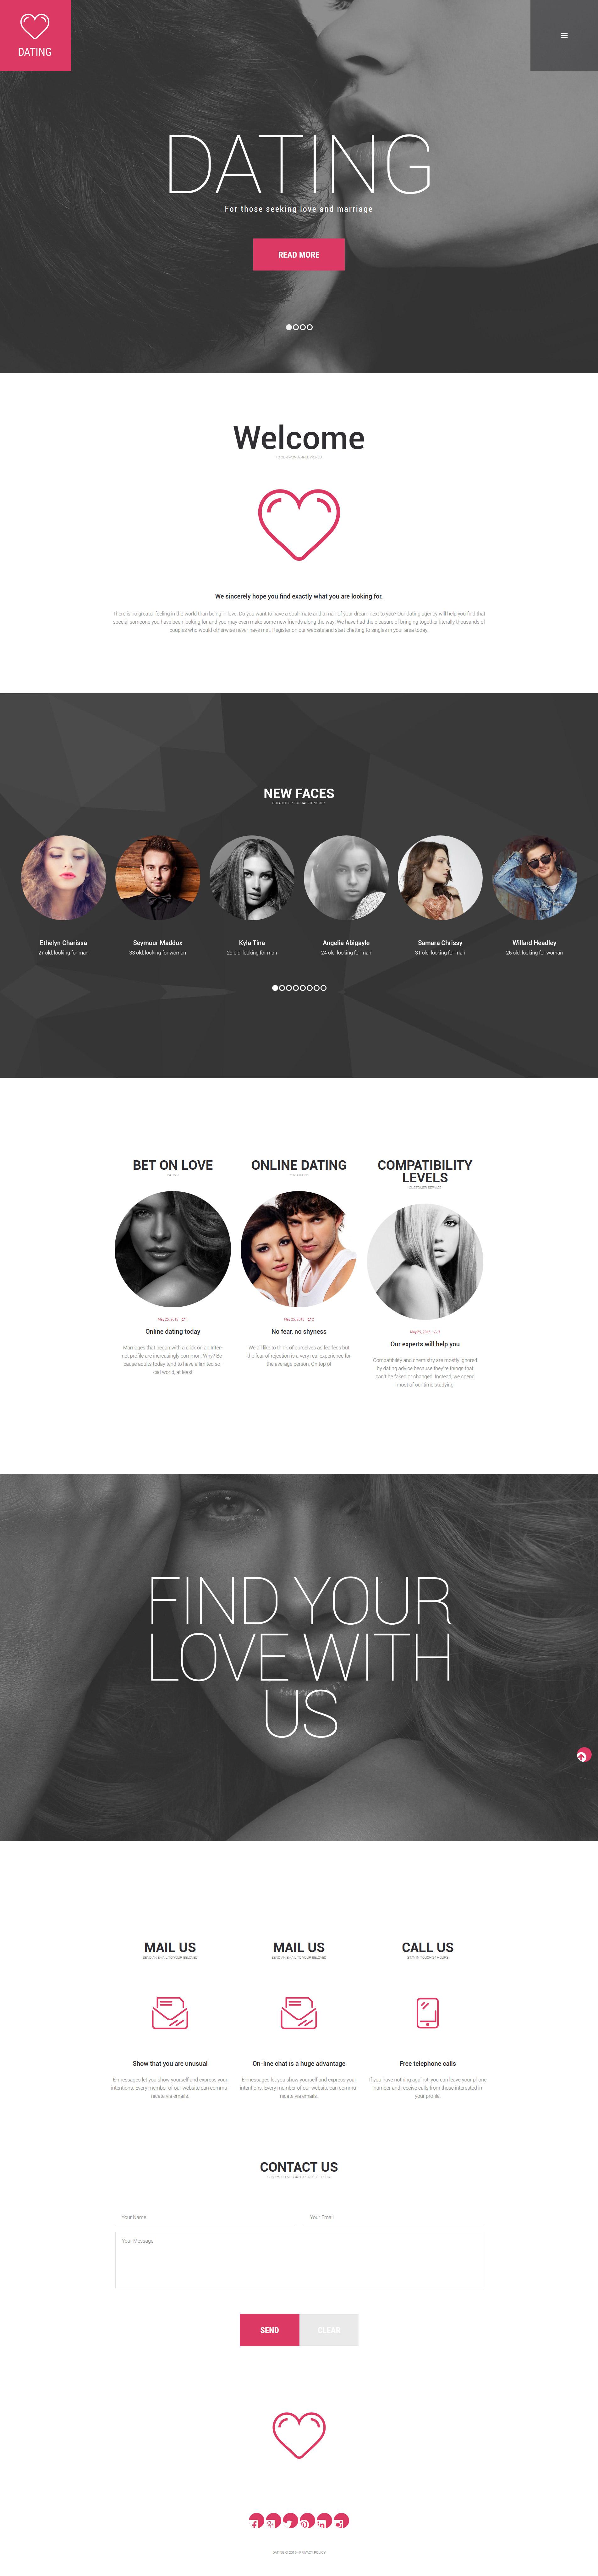 Responsive Dating Agency Wordpress #55820